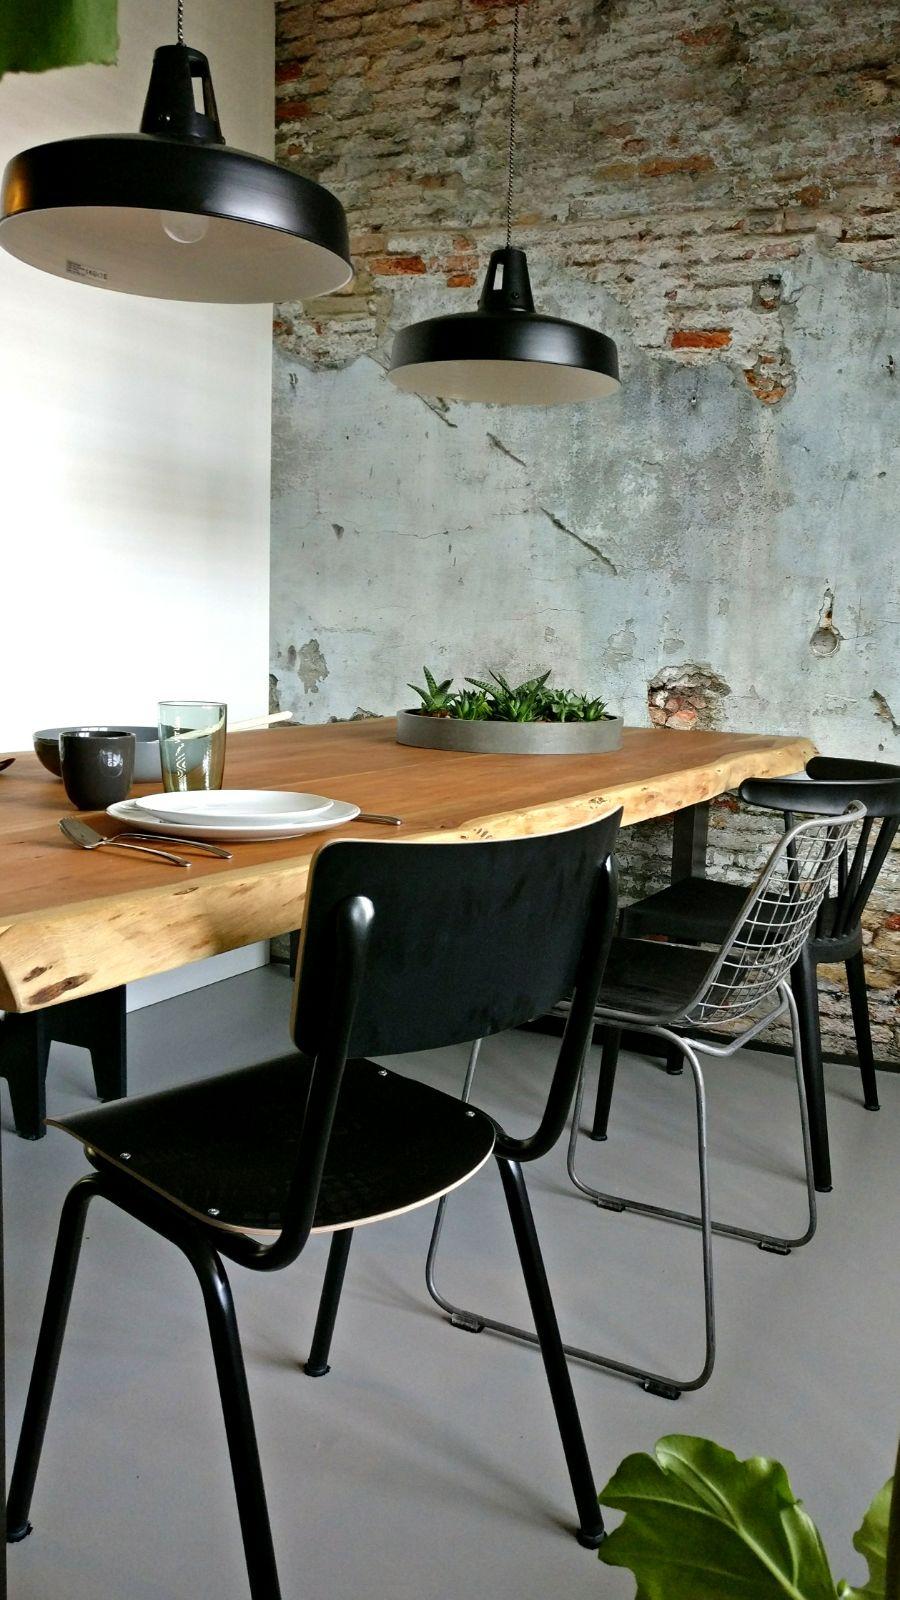 appartement nieuwbouw industrieel stoer boomstam tafel eettafel zwarte keuken eiken keuken planten urban jungle (2).jpg